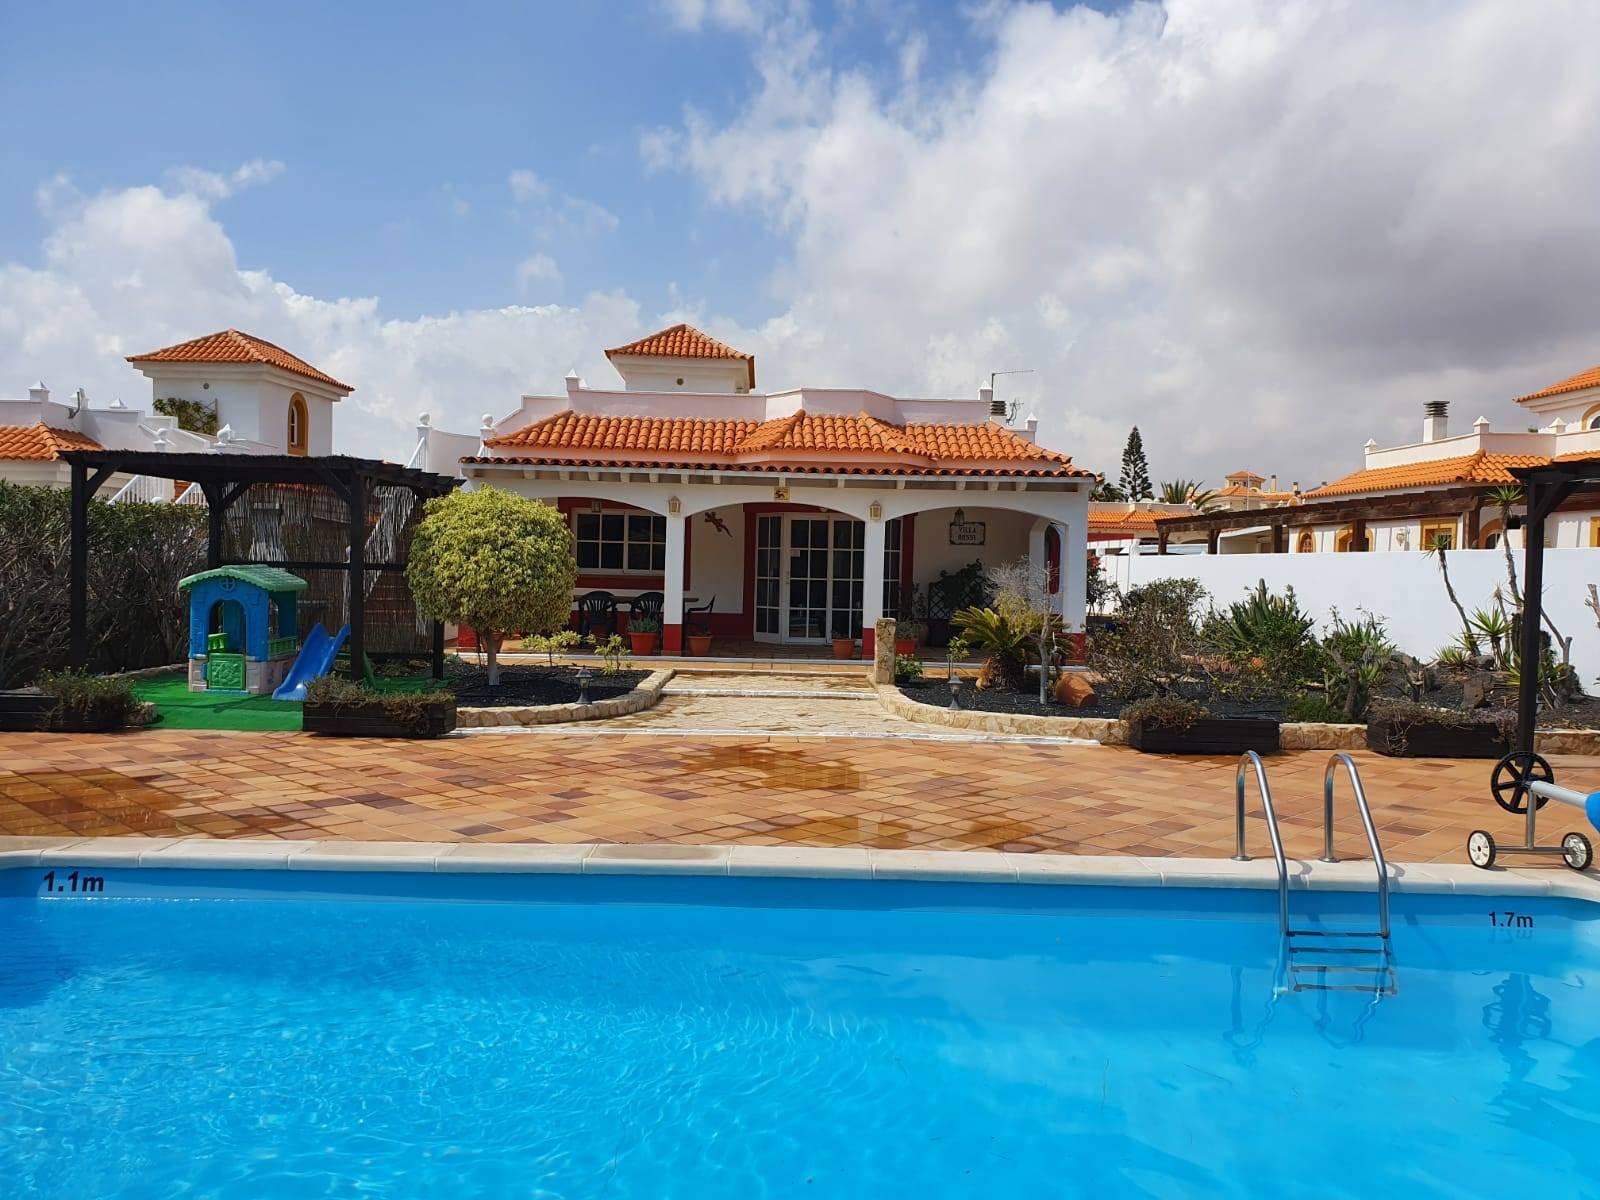 Rear View of Casa De Rossi